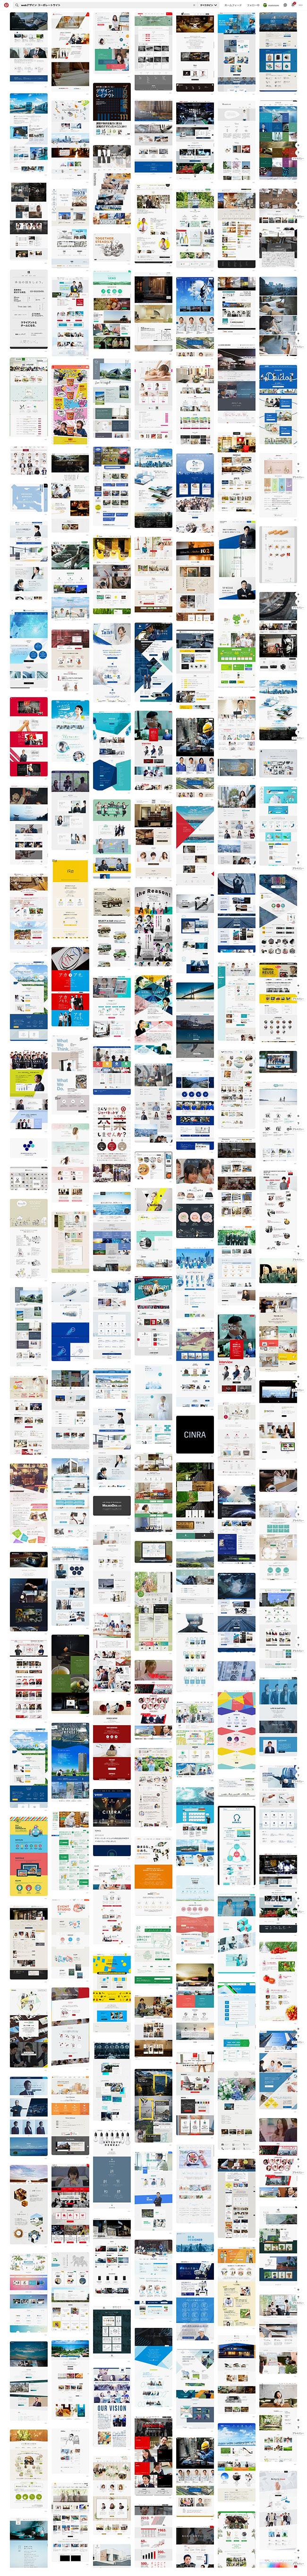 Pinterestの検索結果